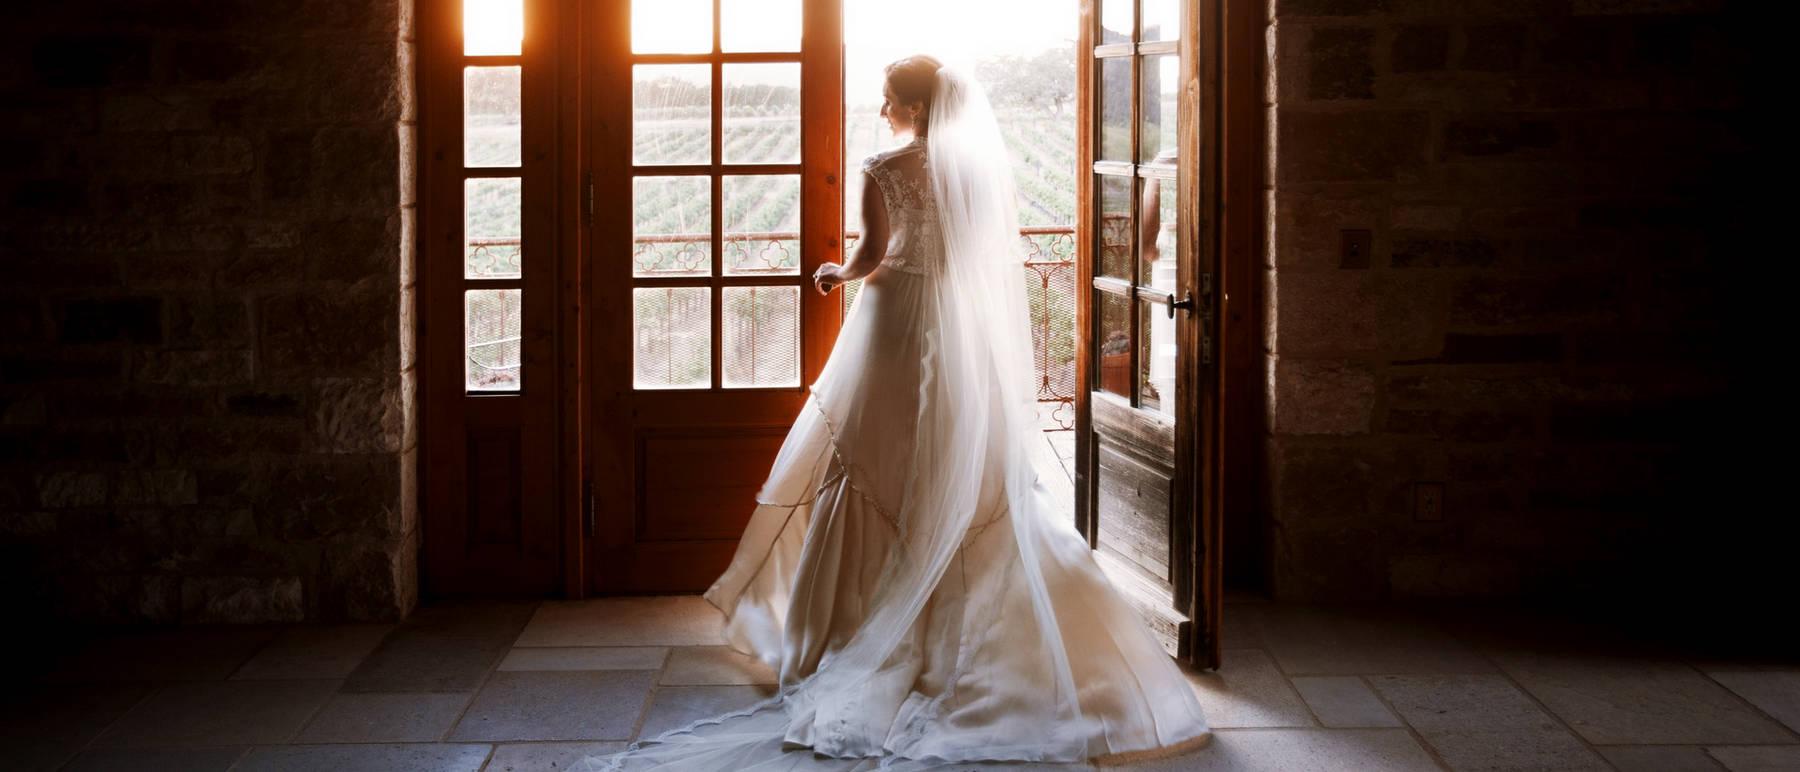 johnandjoseph-wedding-photographer-hz-slider-138